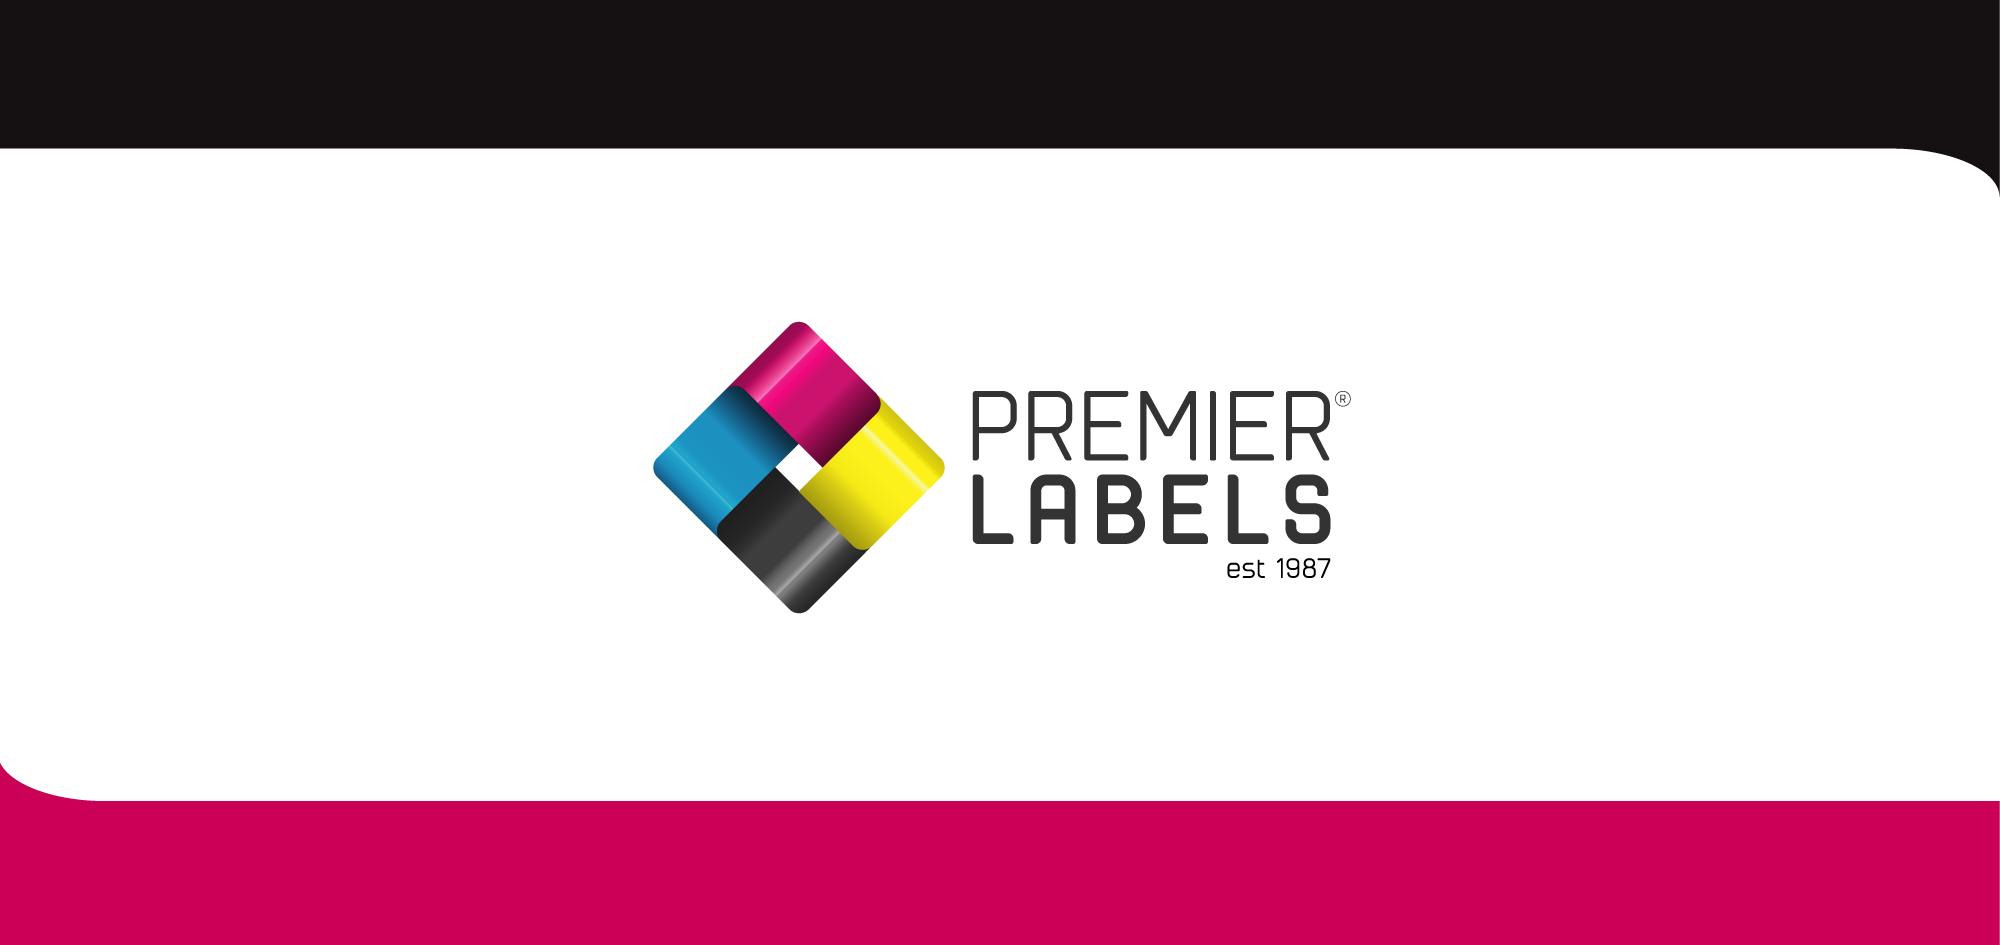 Premier Labels brand